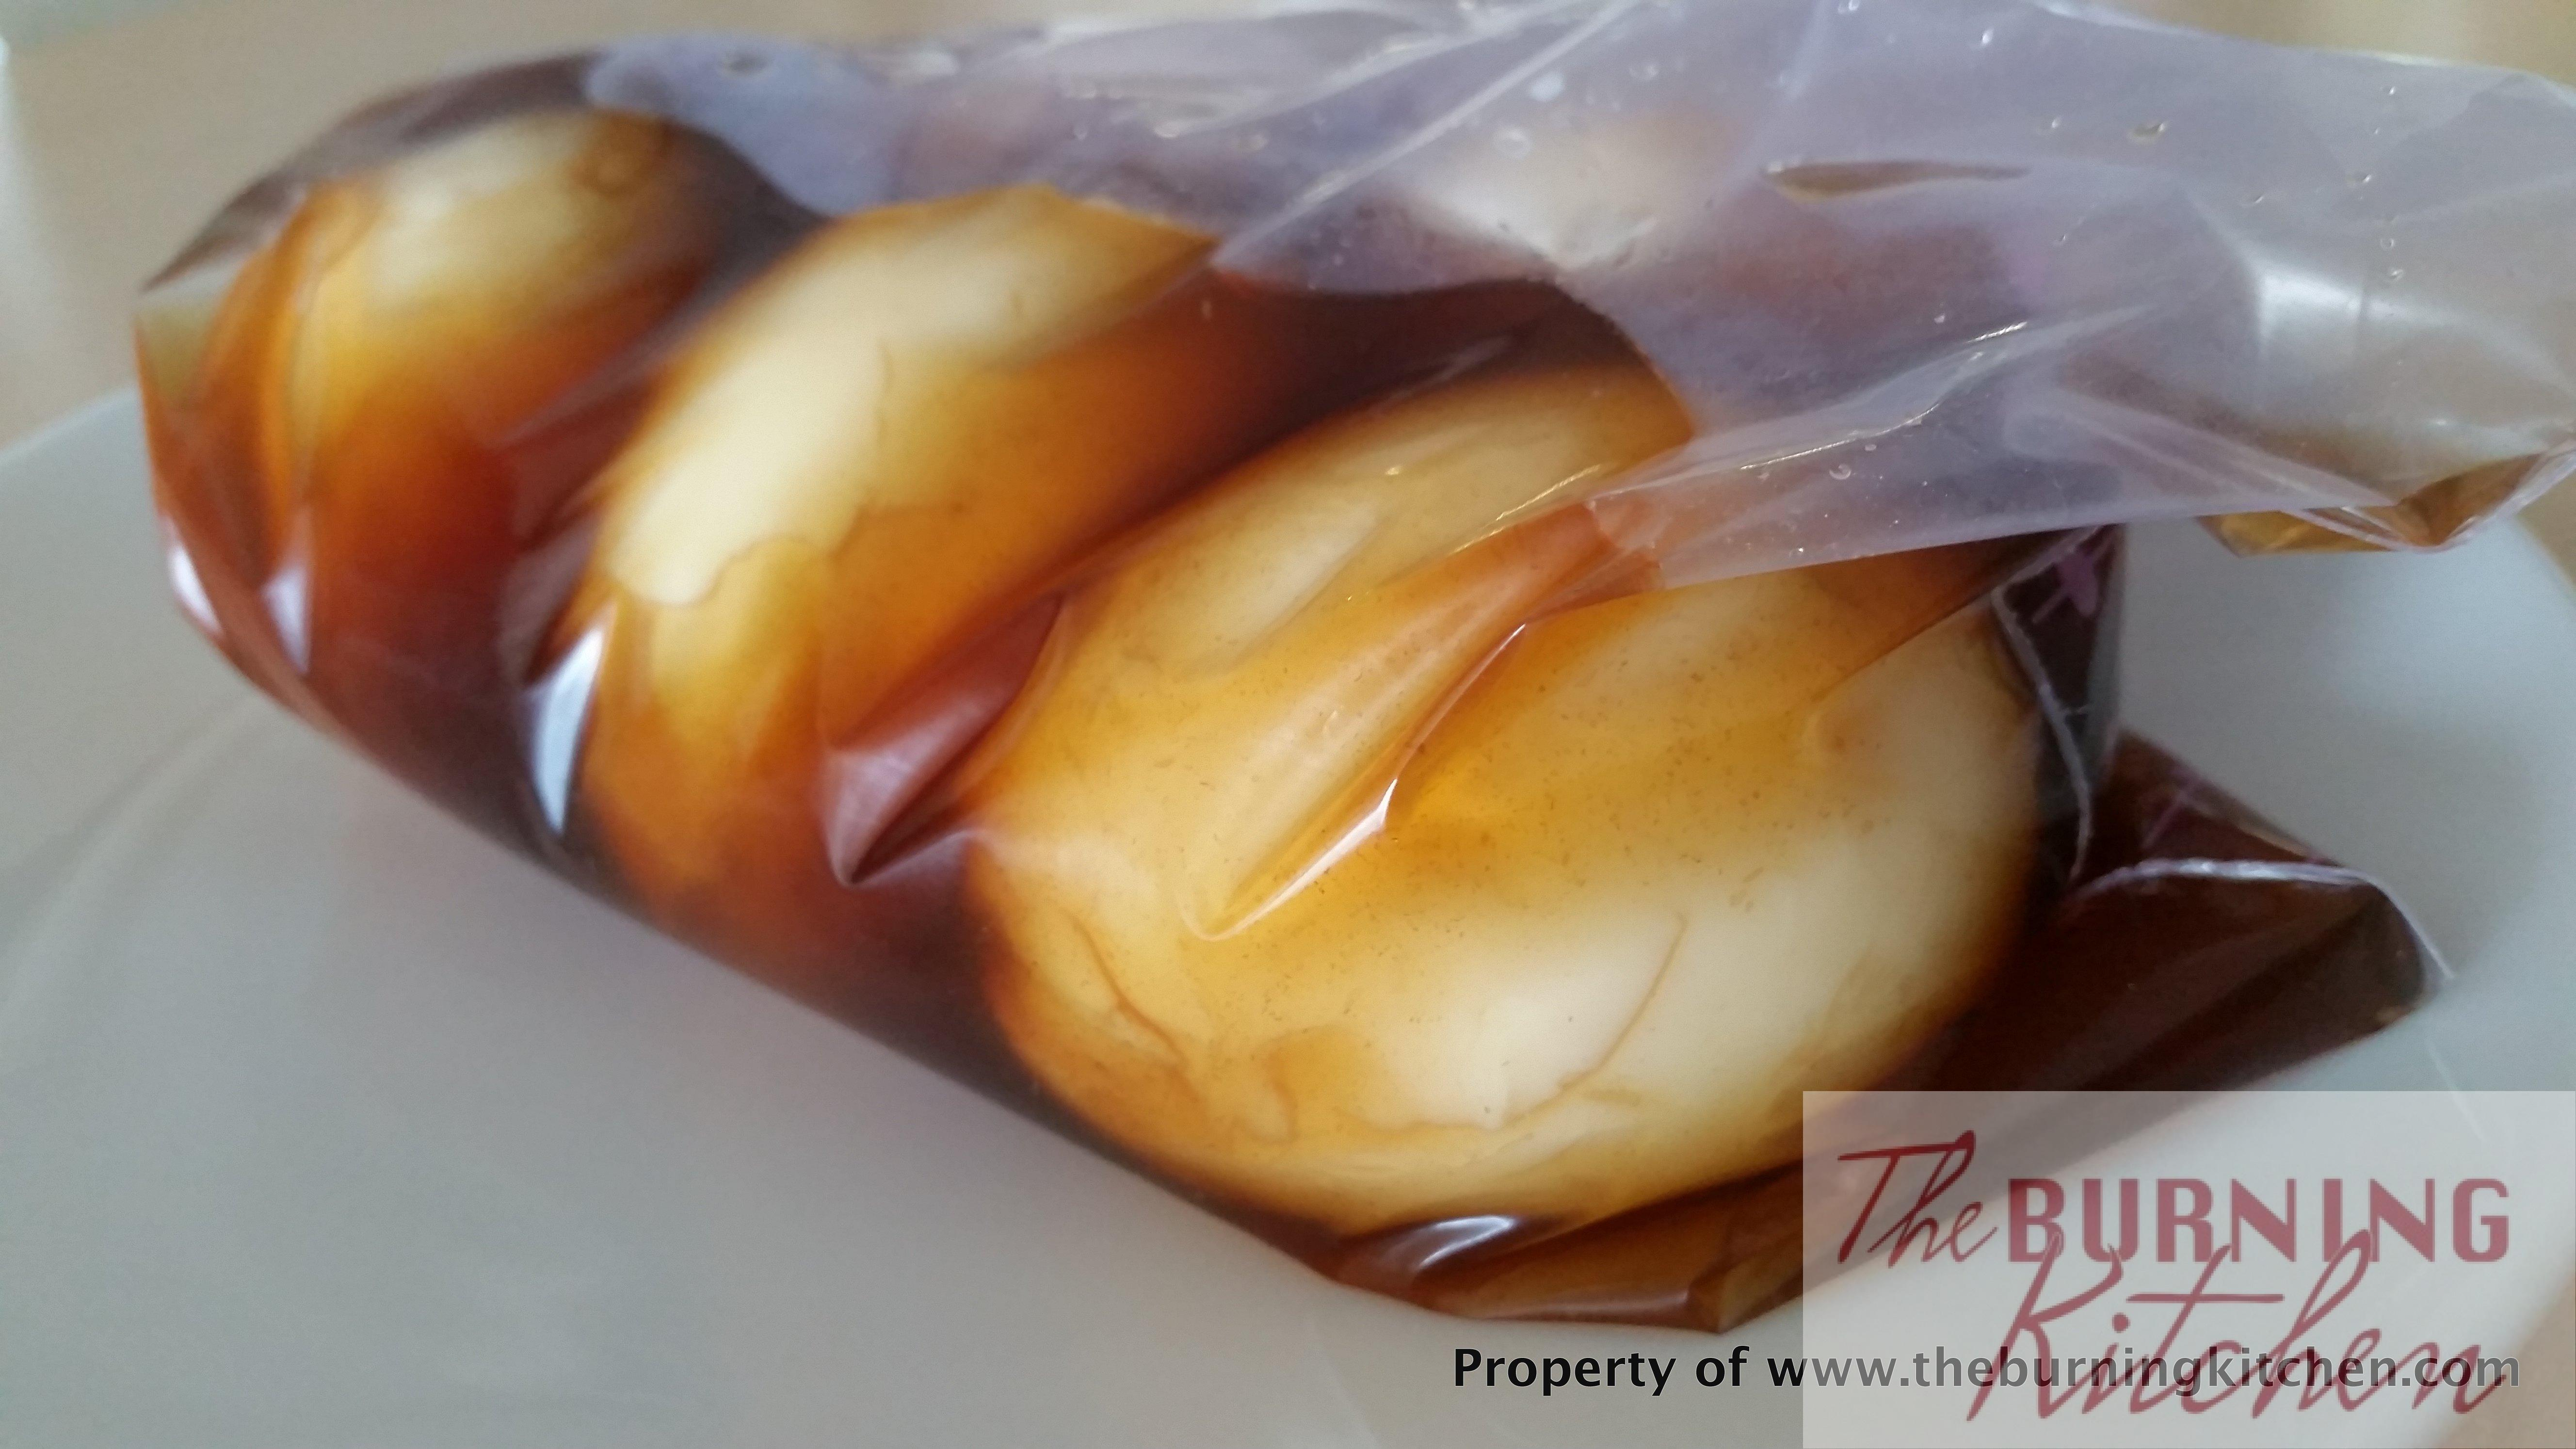 Japanese_Soft_Boiled_Egg_Shoyu_Tamago_Recipe_And_Step_By_Step_Photo_Tutorial